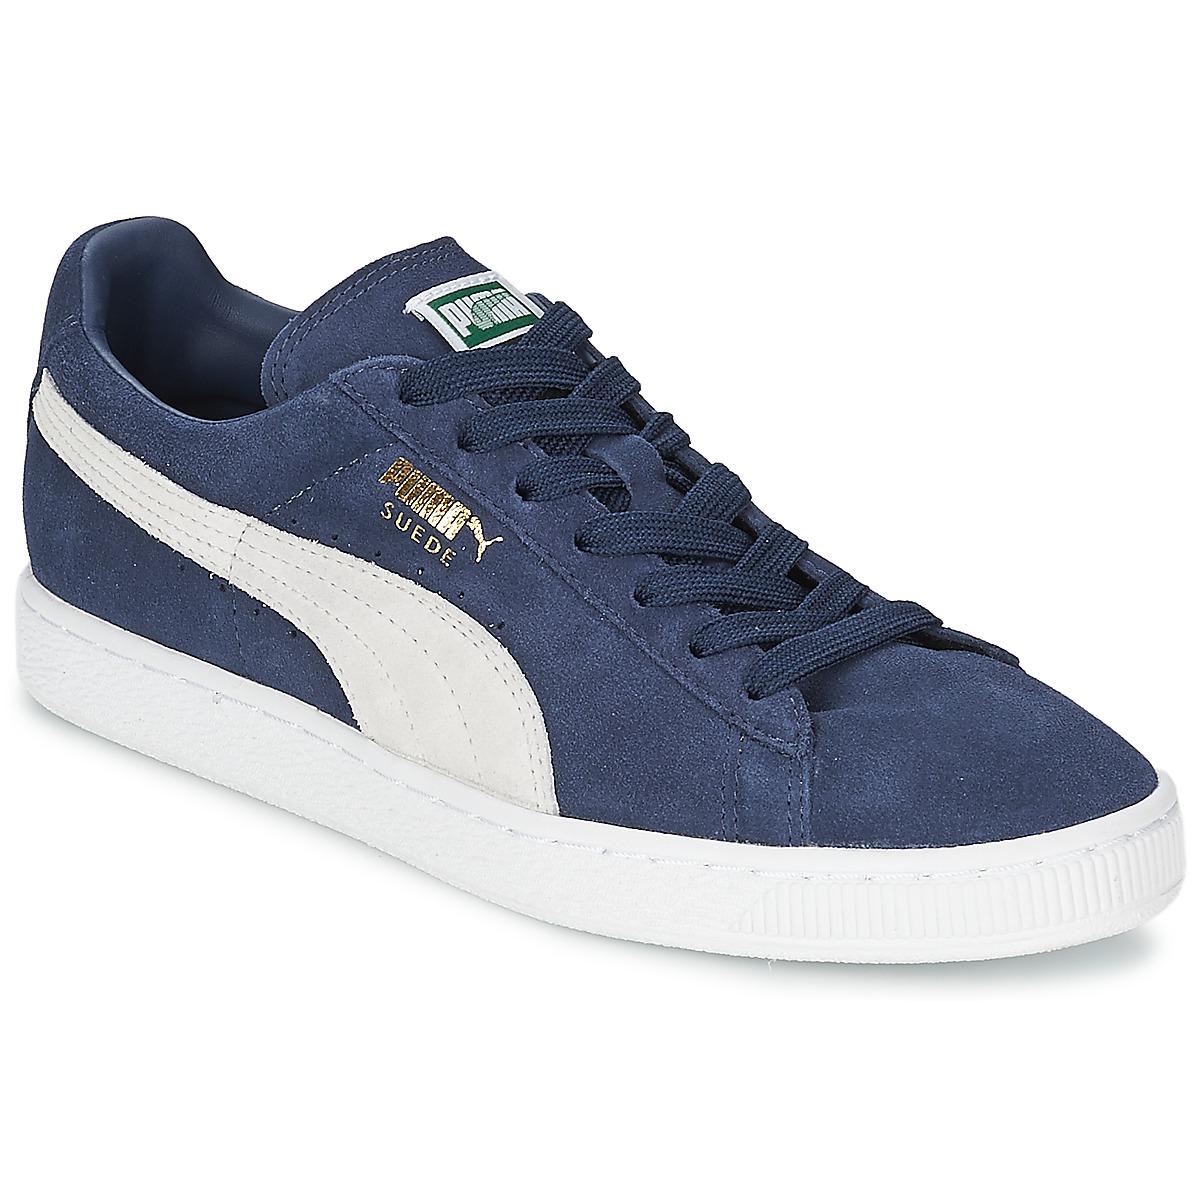 Puma Suede Classic Blauw